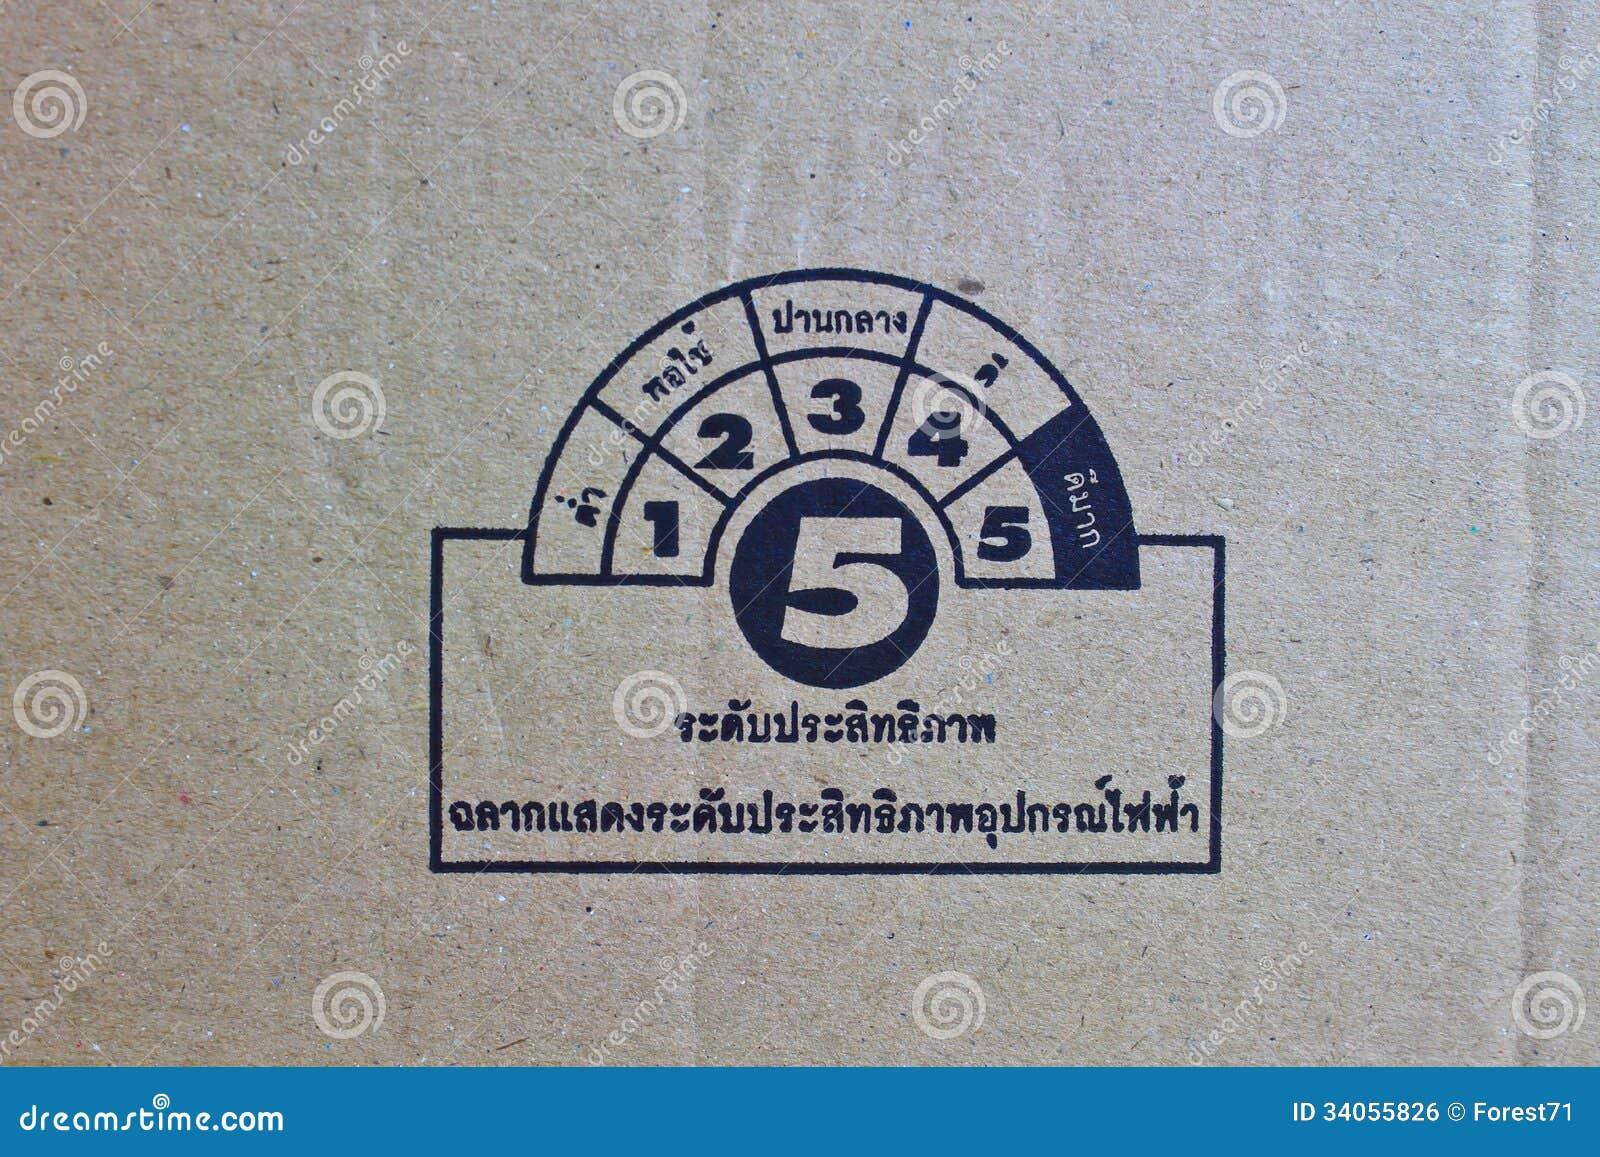 Symbole sur le carton